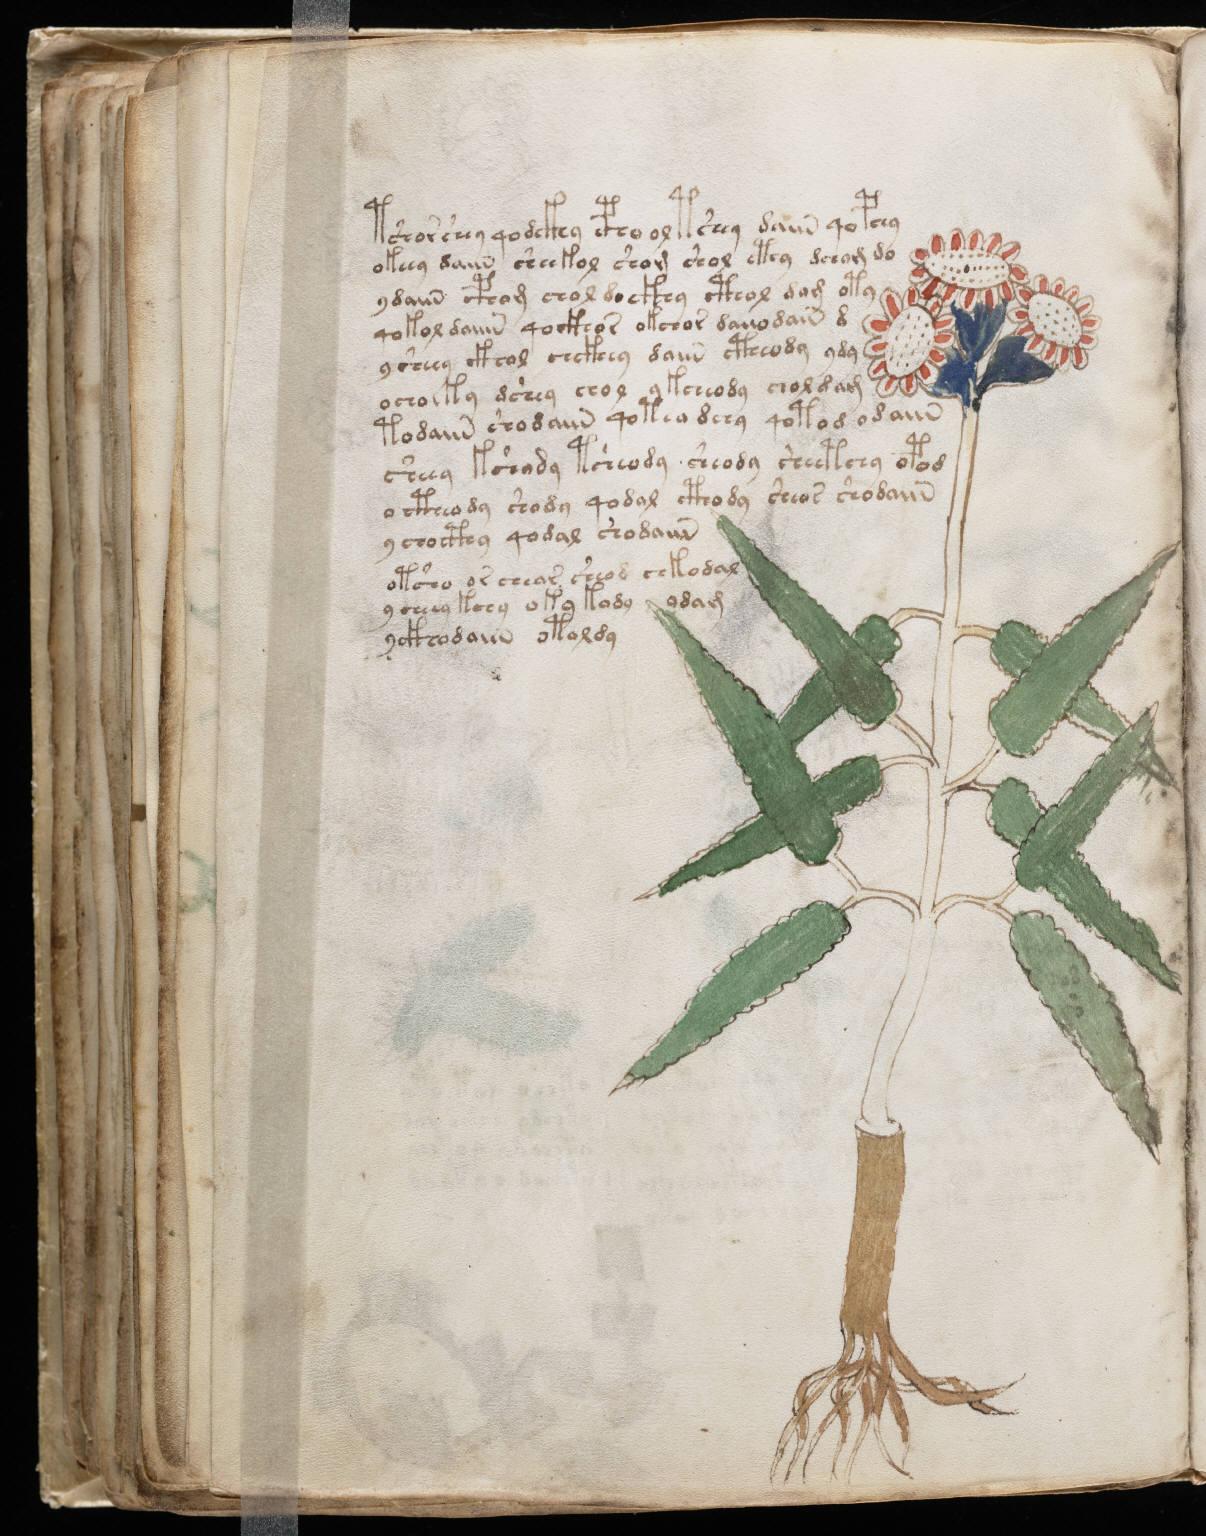 Voynich Manuscript %28106%29 ヴォイニッチ手稿(写本) どの言語にも属さない謎の文字!